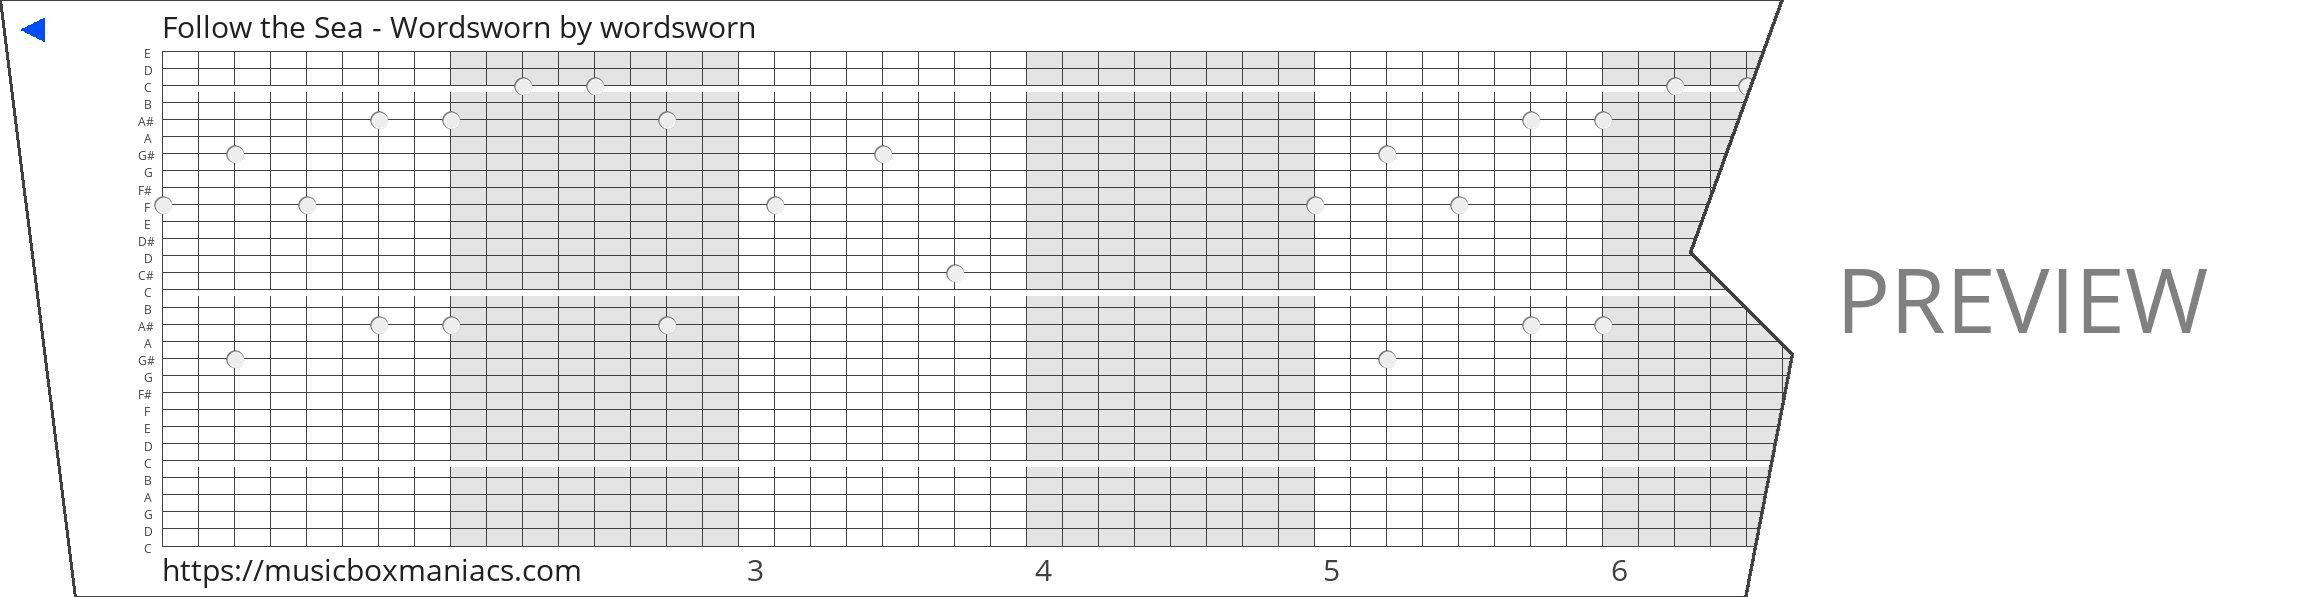 Follow the Sea - Wordsworn 30 note music box paper strip